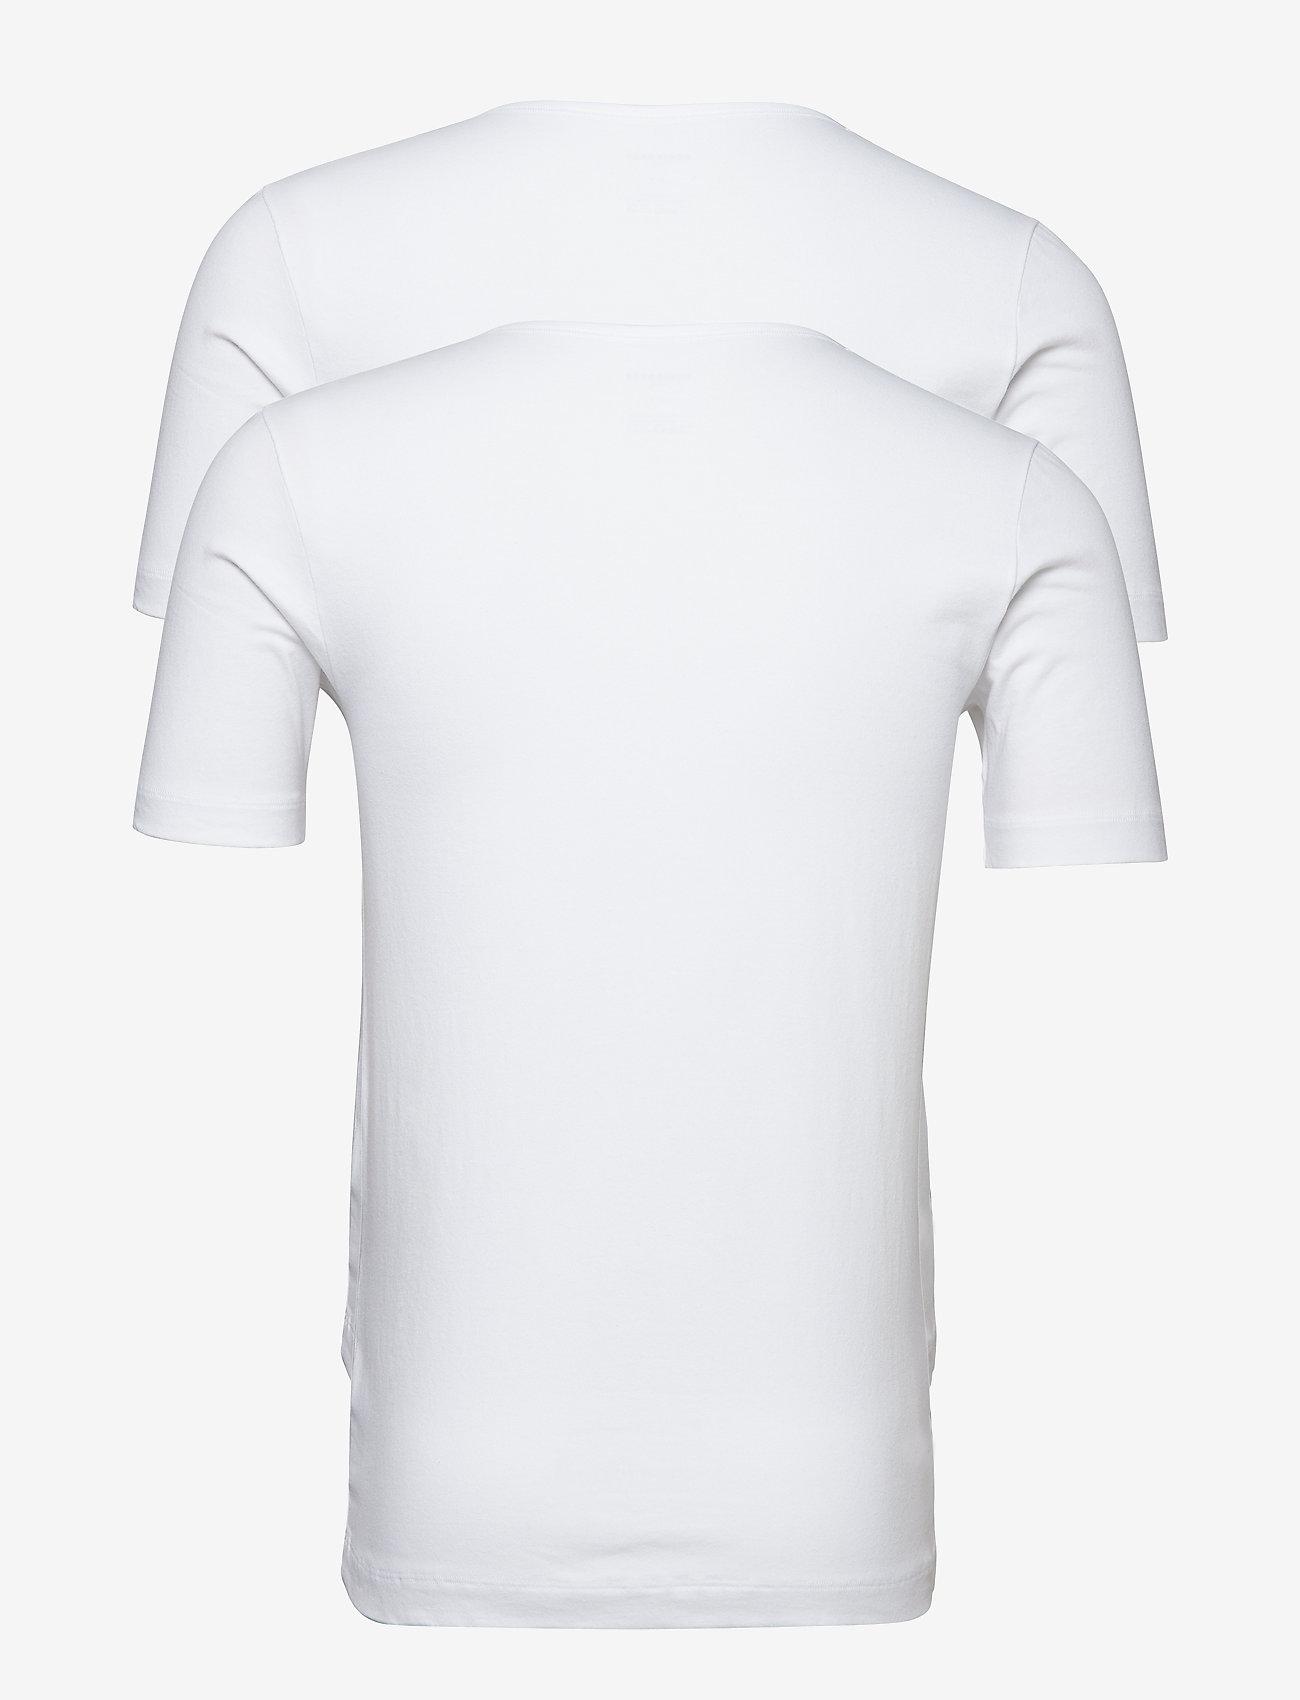 Schiesser - Shirt 1/2 - multipack - white - 1